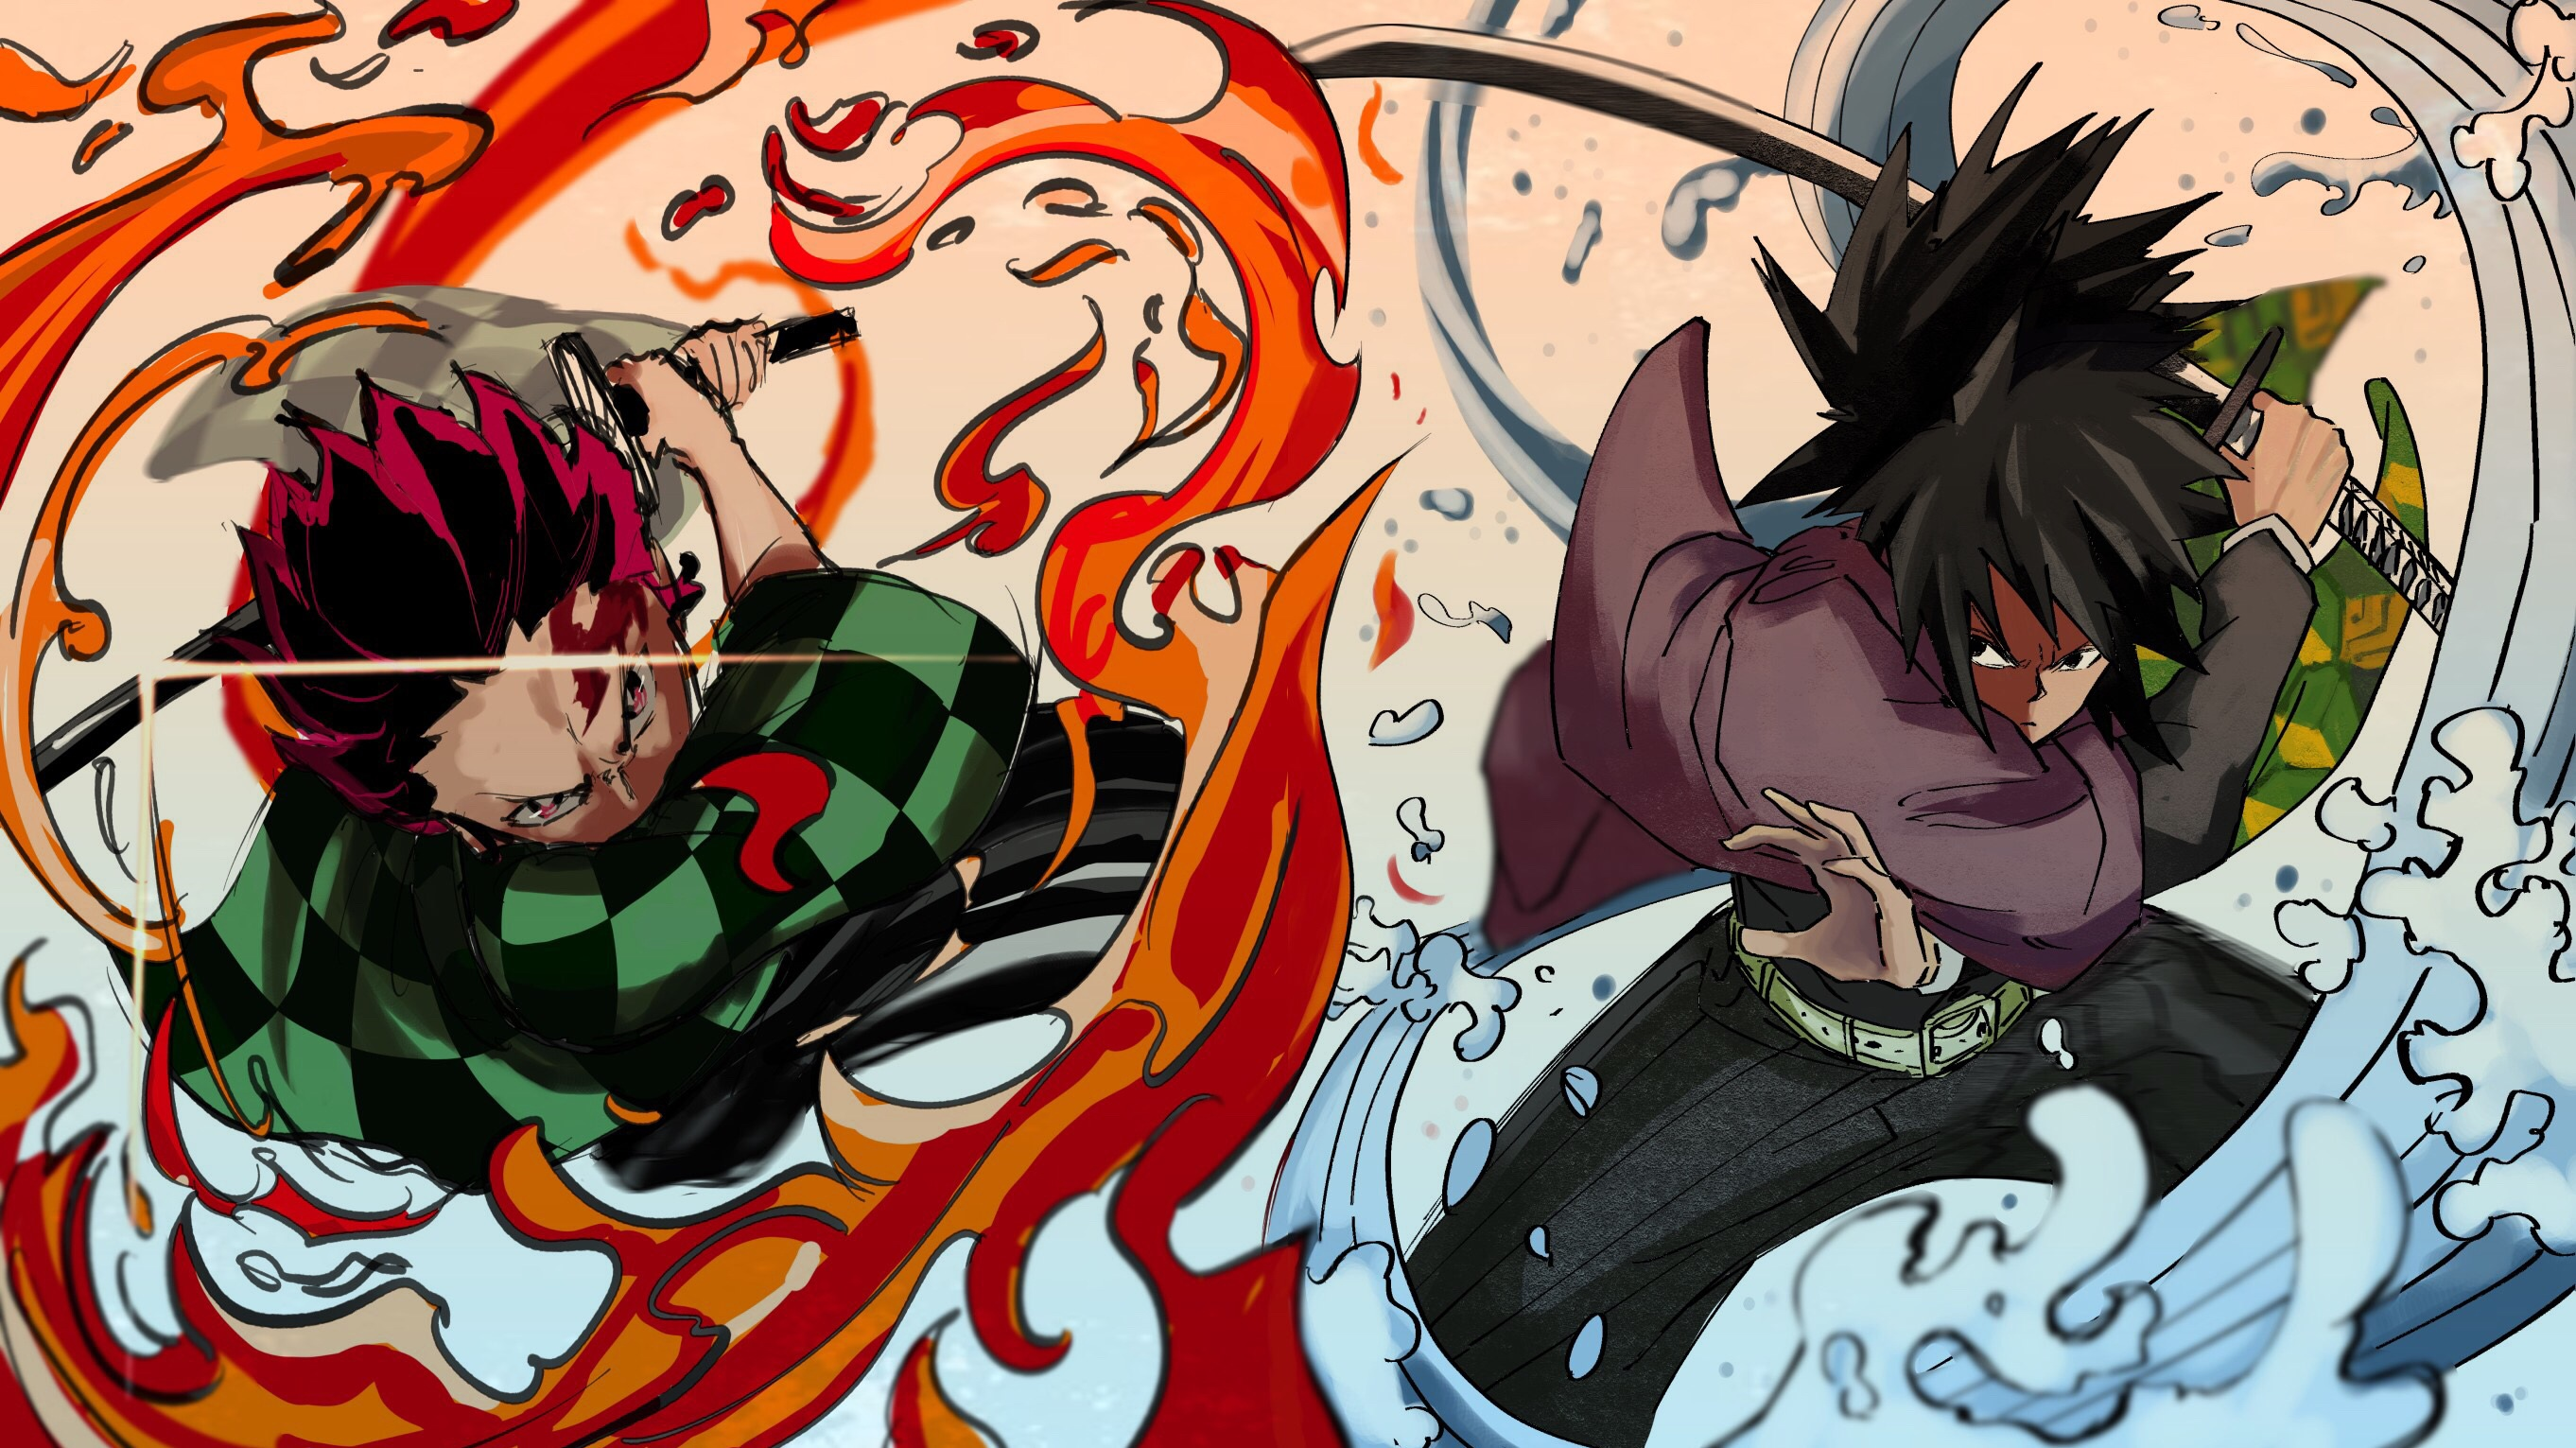 Demon Slayer Kimetsu No Yaiba Uhd Wallpapers Wallpaper Cave